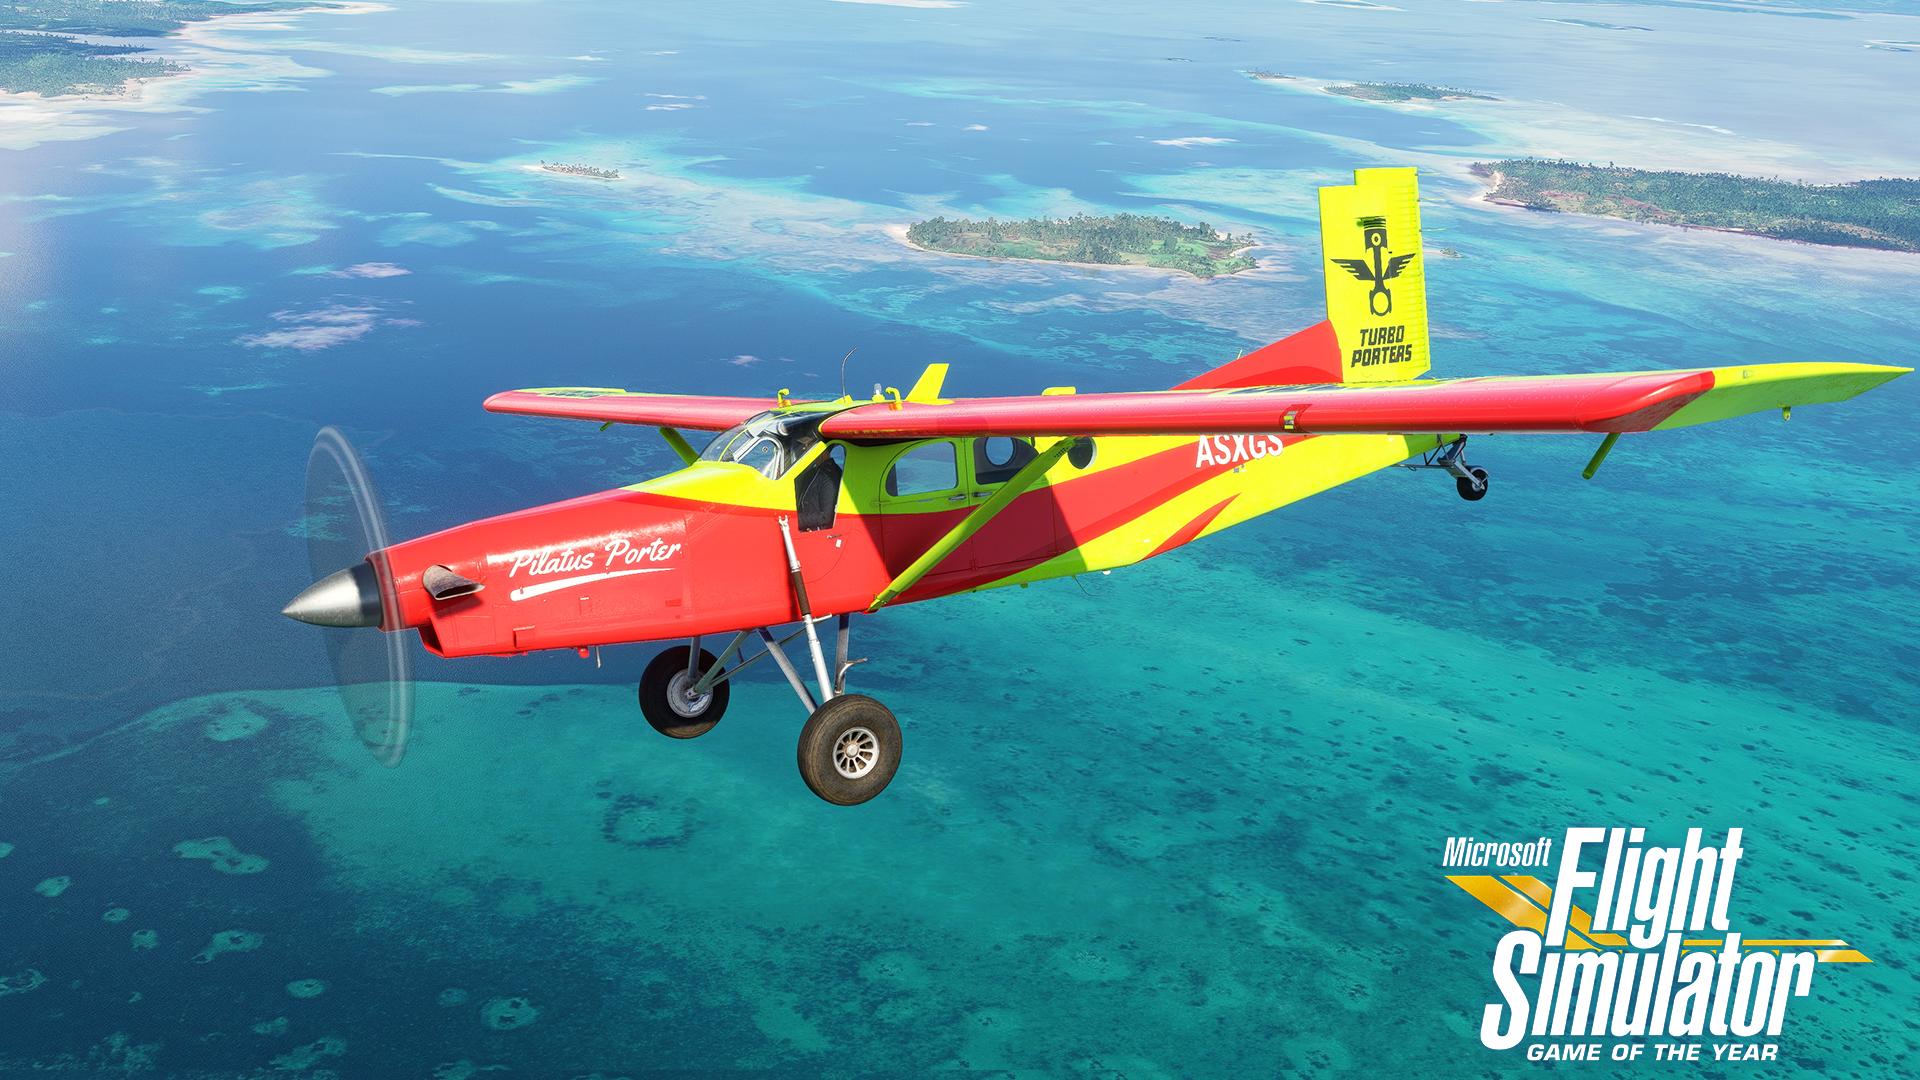 Microsoft Flight Simulator – Game of the Year Edition